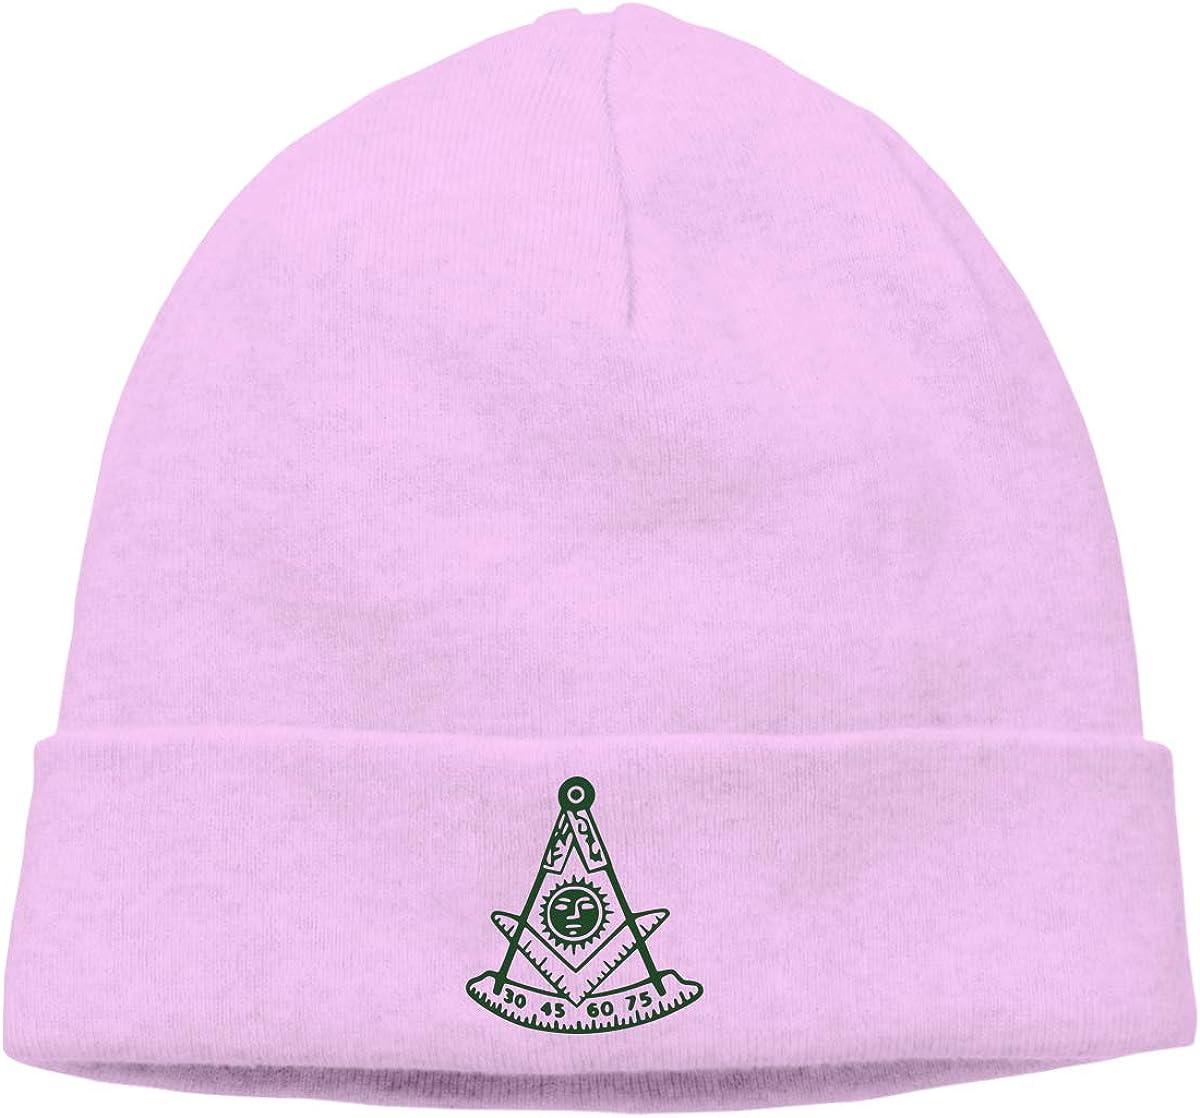 Freemason Sun Skull Caps Beanie Hats for Men Pink